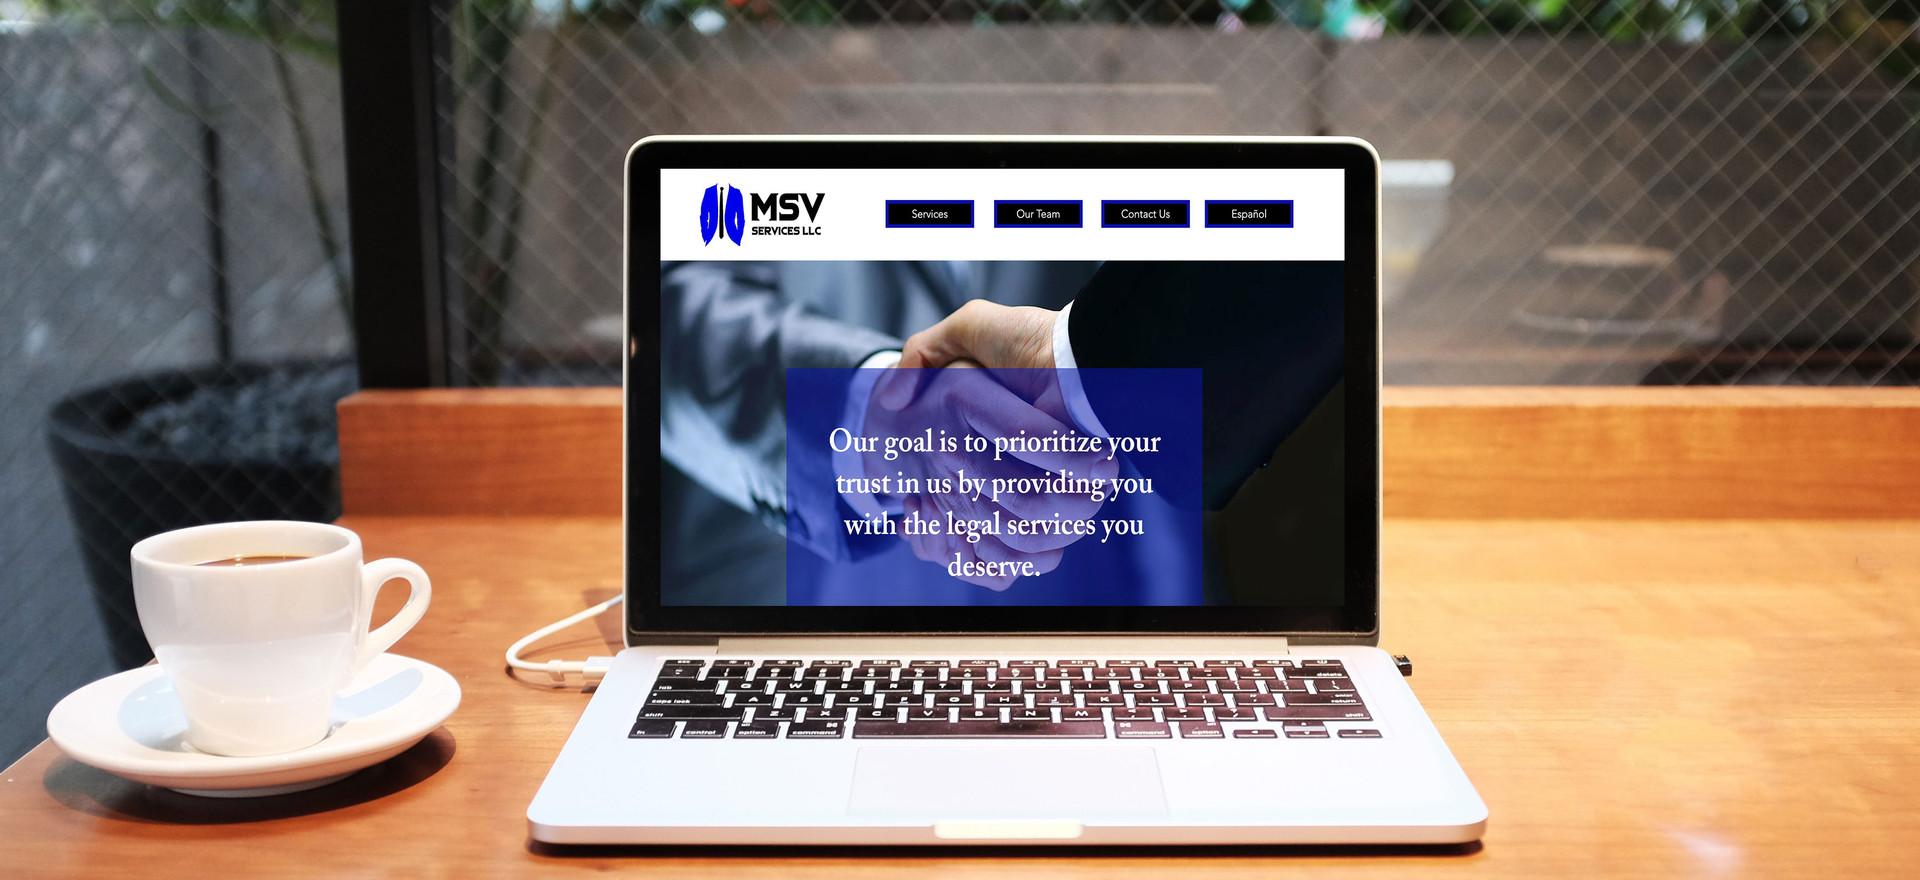 MSV Services LLC